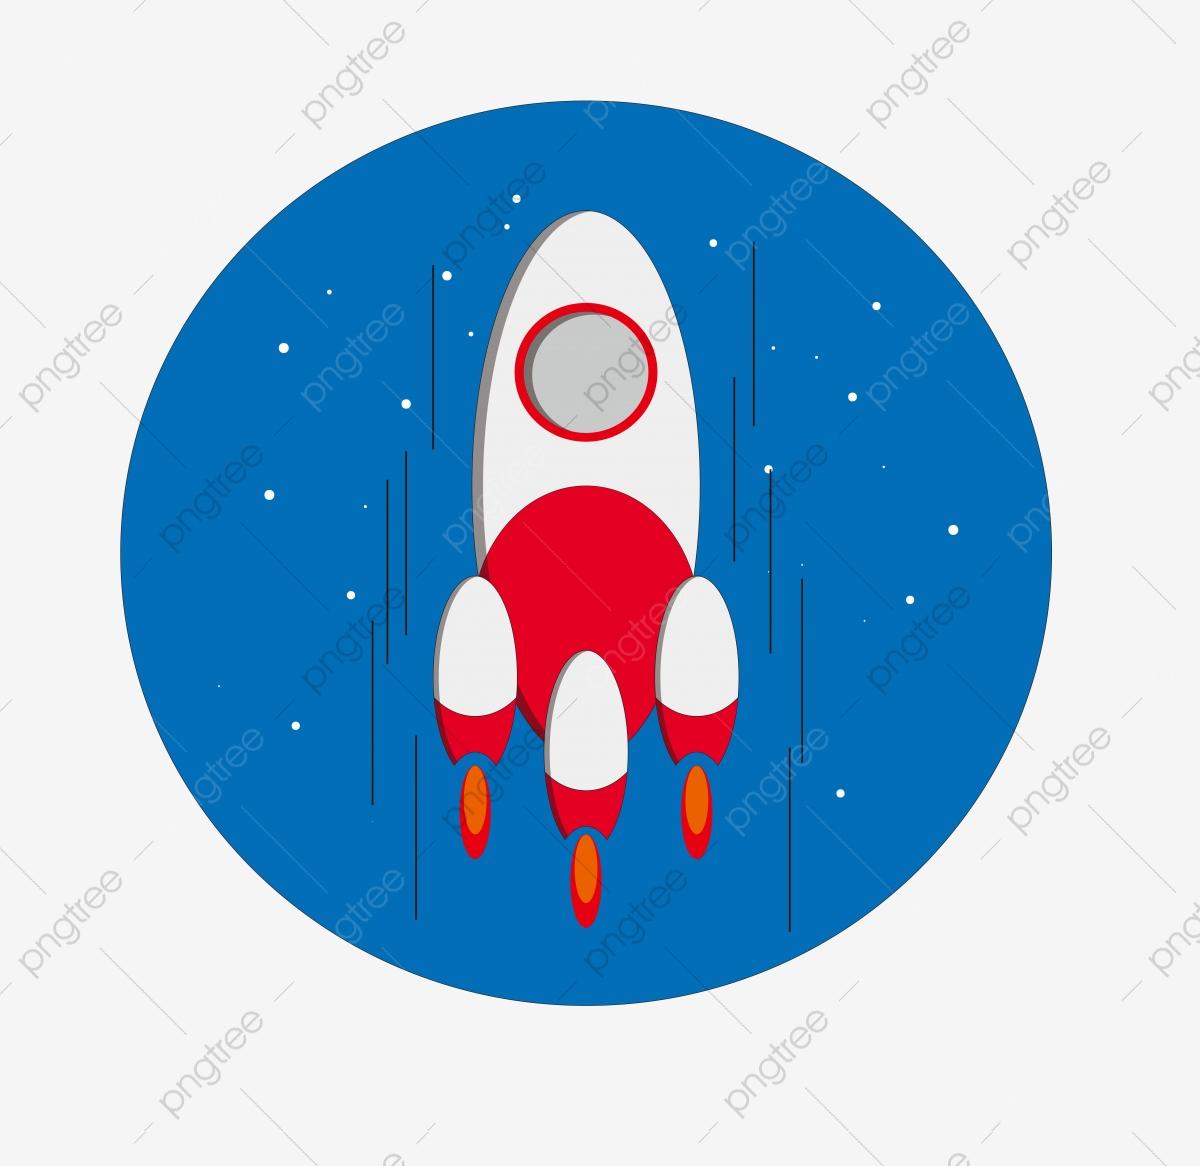 Clipart rocket cute. Aerospace icon element spaceship